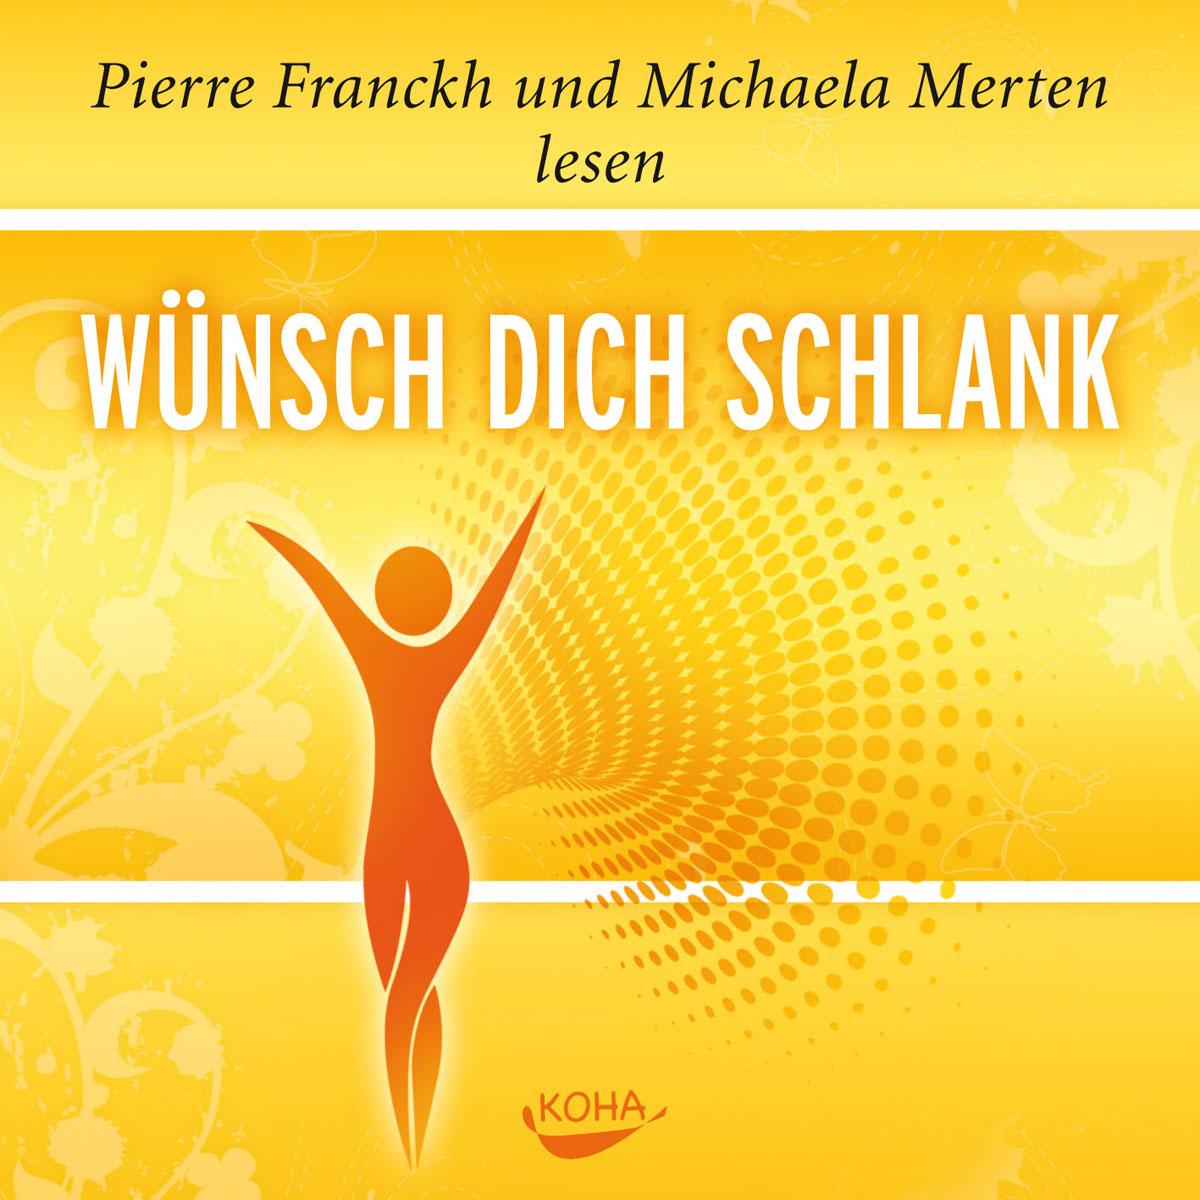 Wünsch dich schlank - Hörbuch Pierre Franckh